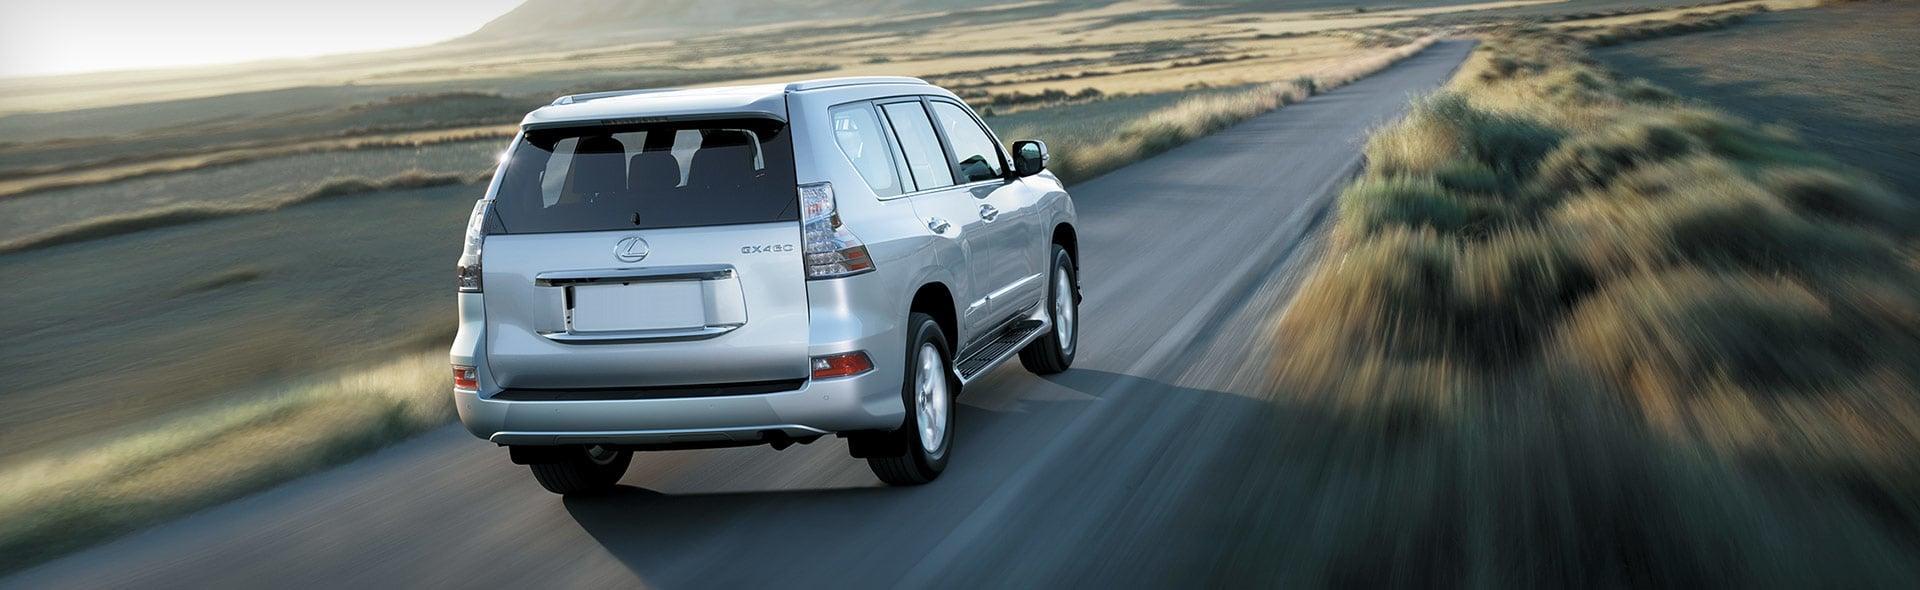 Lexus Roadhazard protection